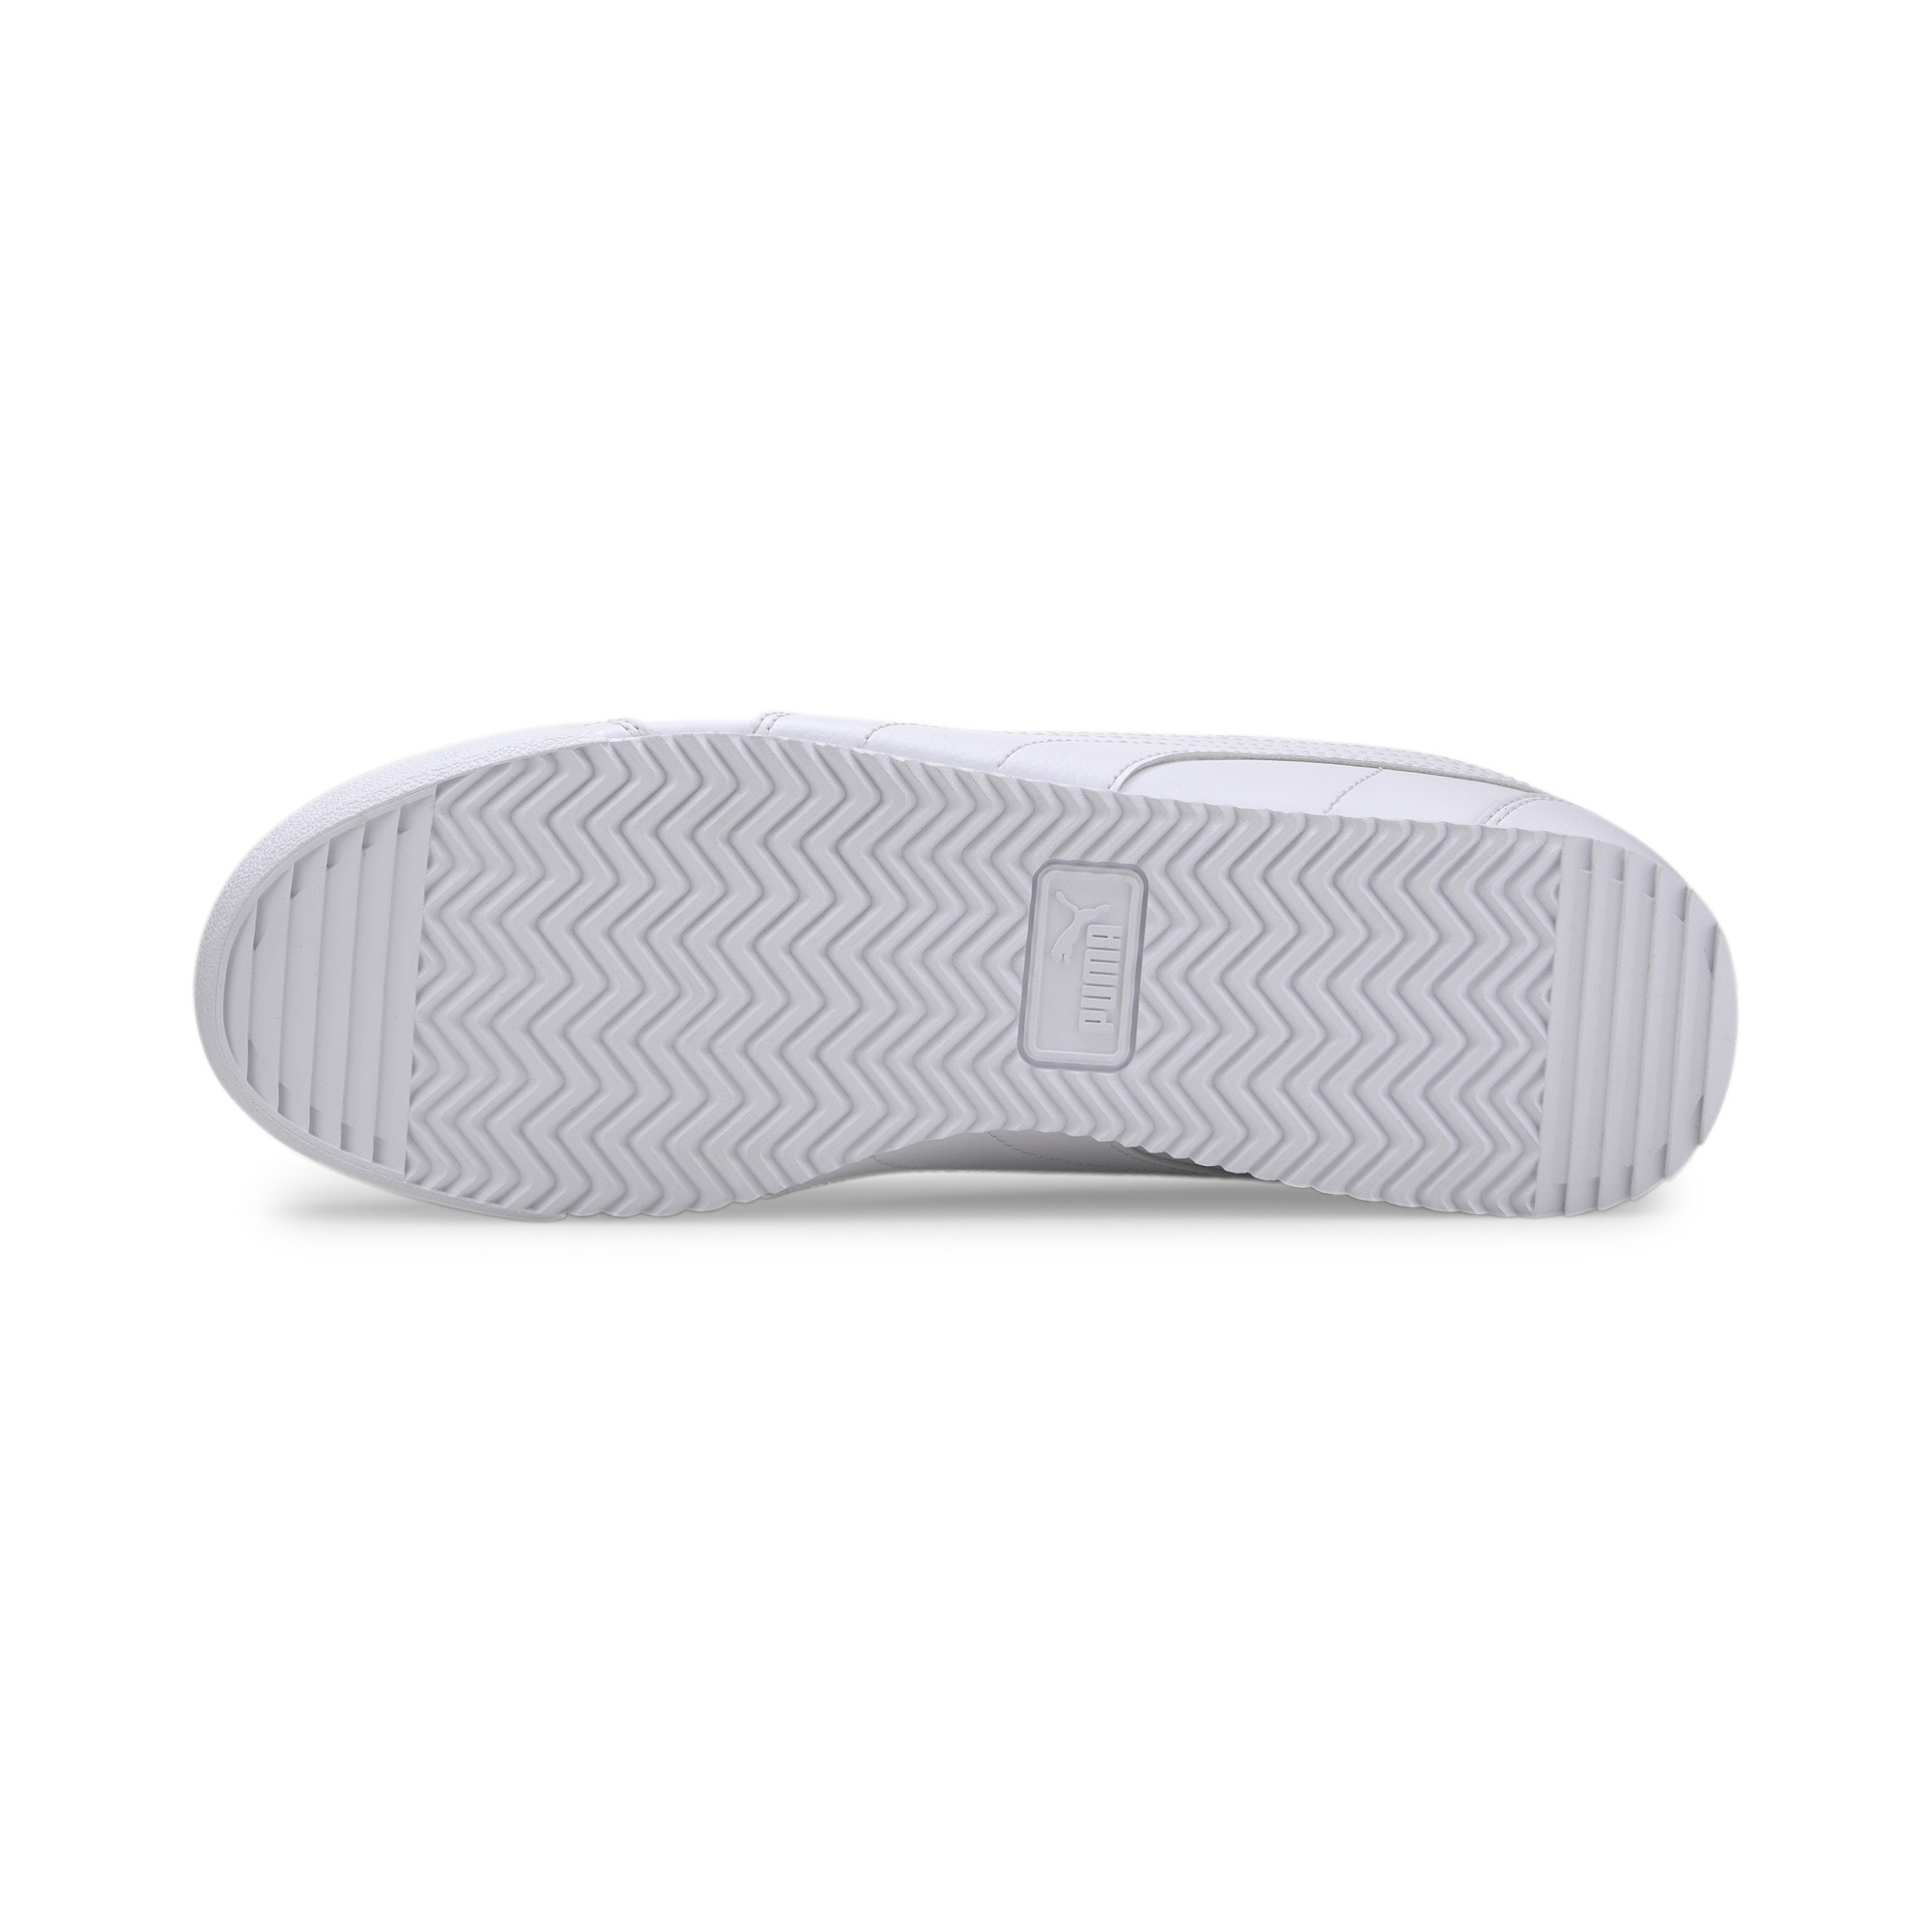 PUMA-Men-039-s-Turino-SL-Sneakers thumbnail 6